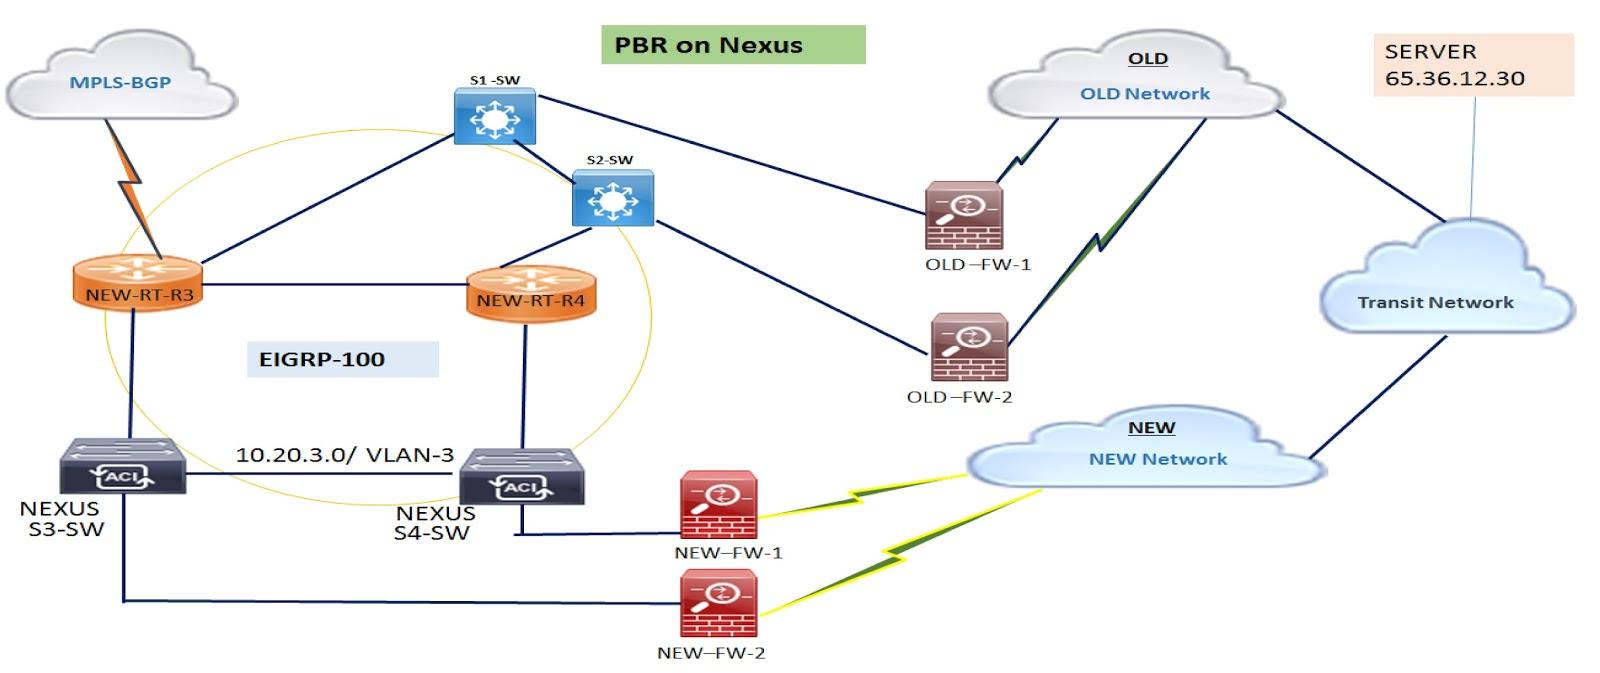 Network Lab's